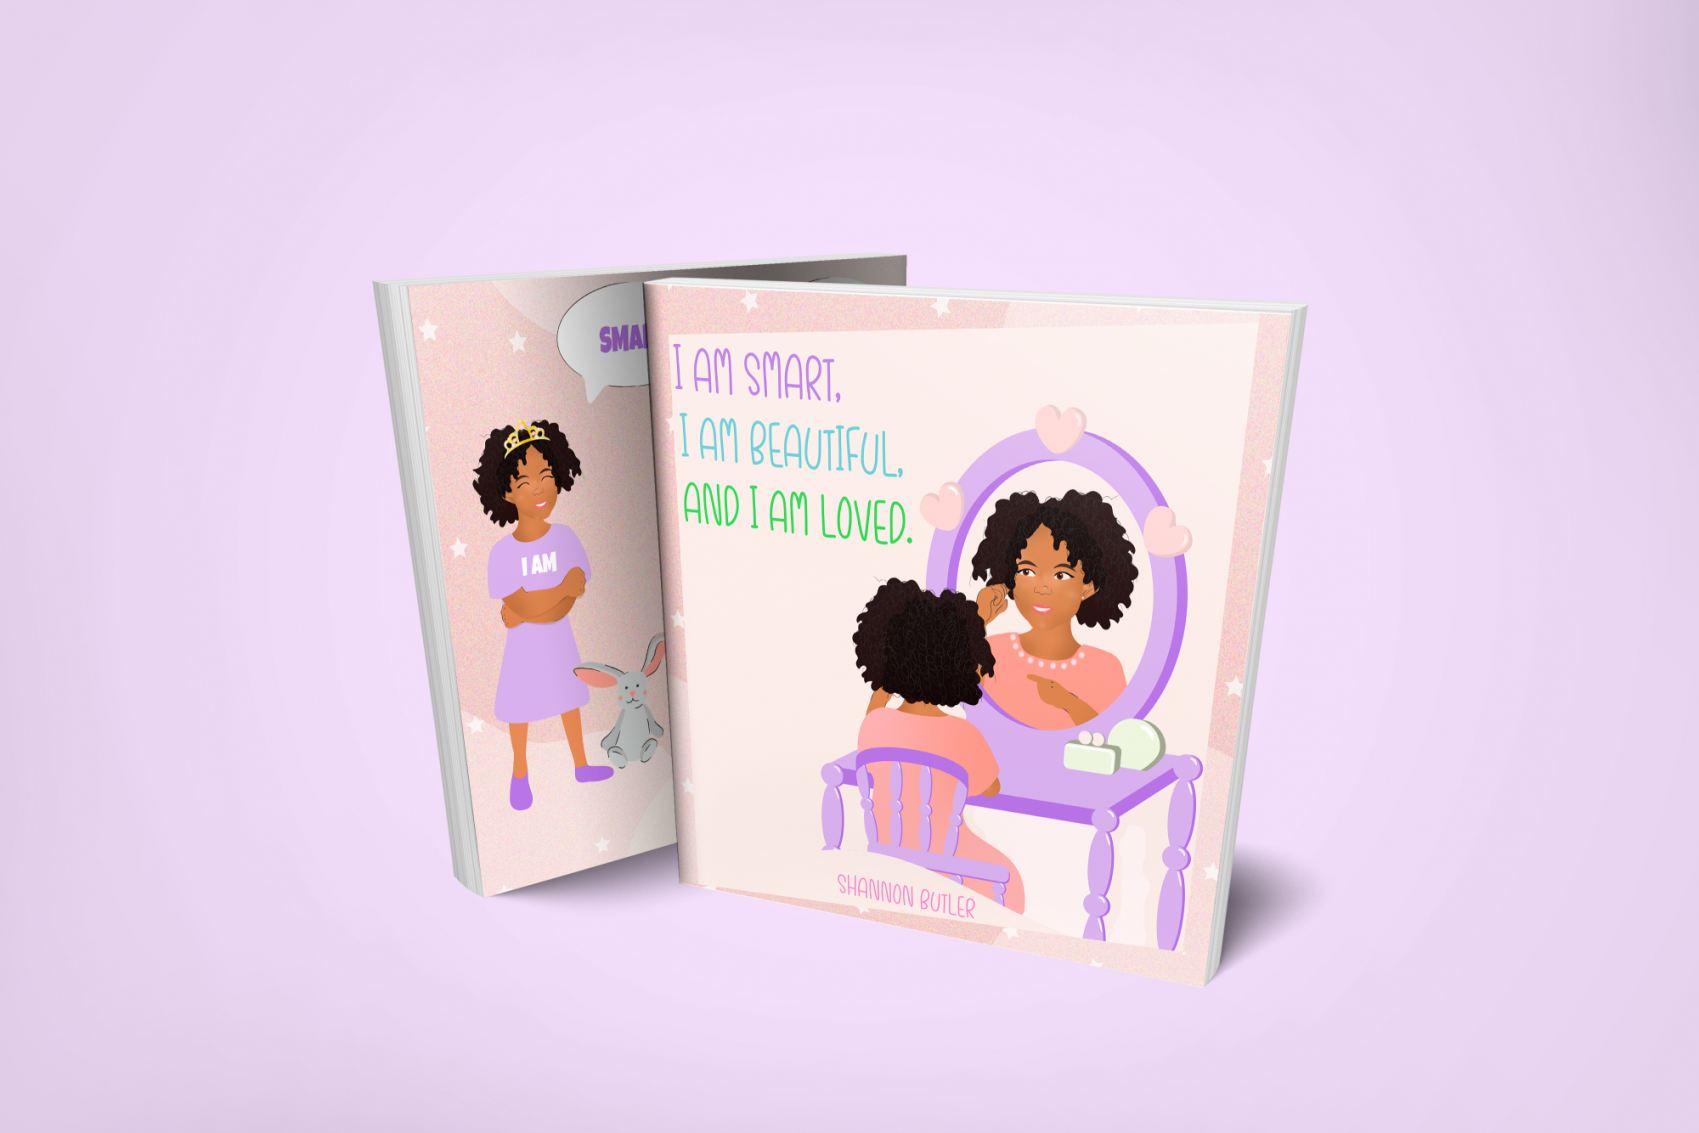 I Am Smart, I Am Beautiful, and I Am Loved Book